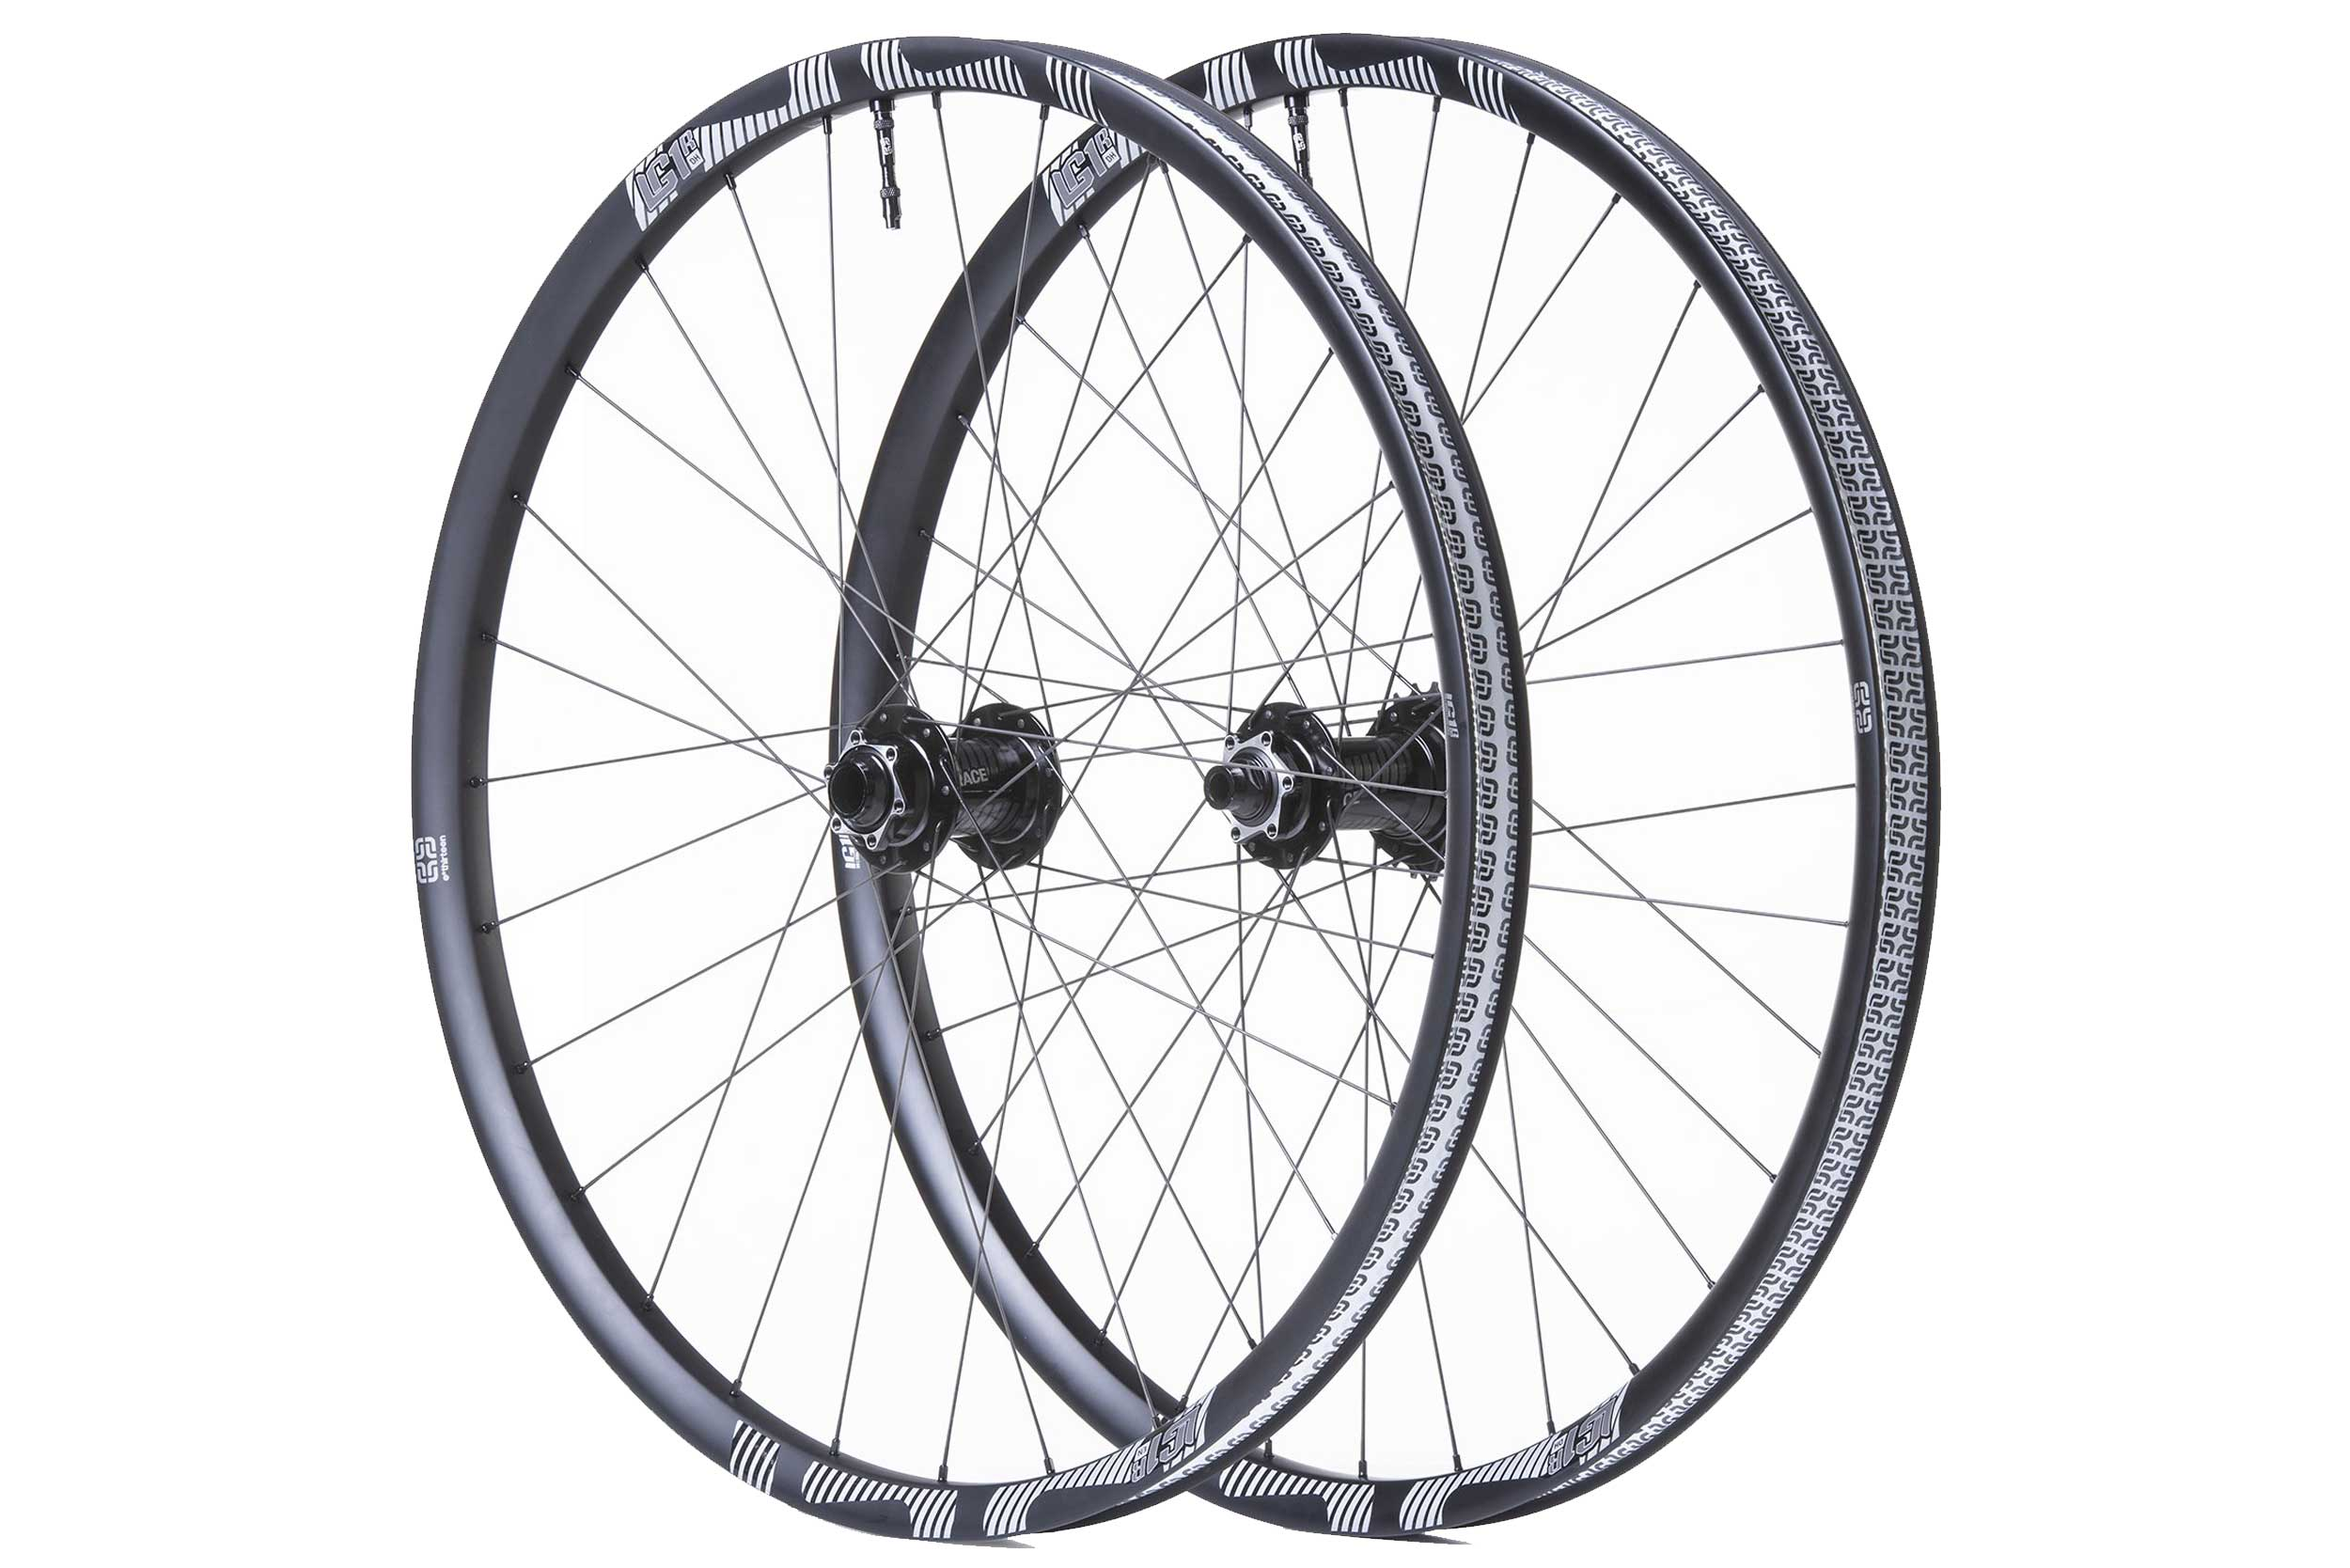 wheels: LG1 carbon/ alloy chain guides: LG1 race carbont check out www.ethirteen.com